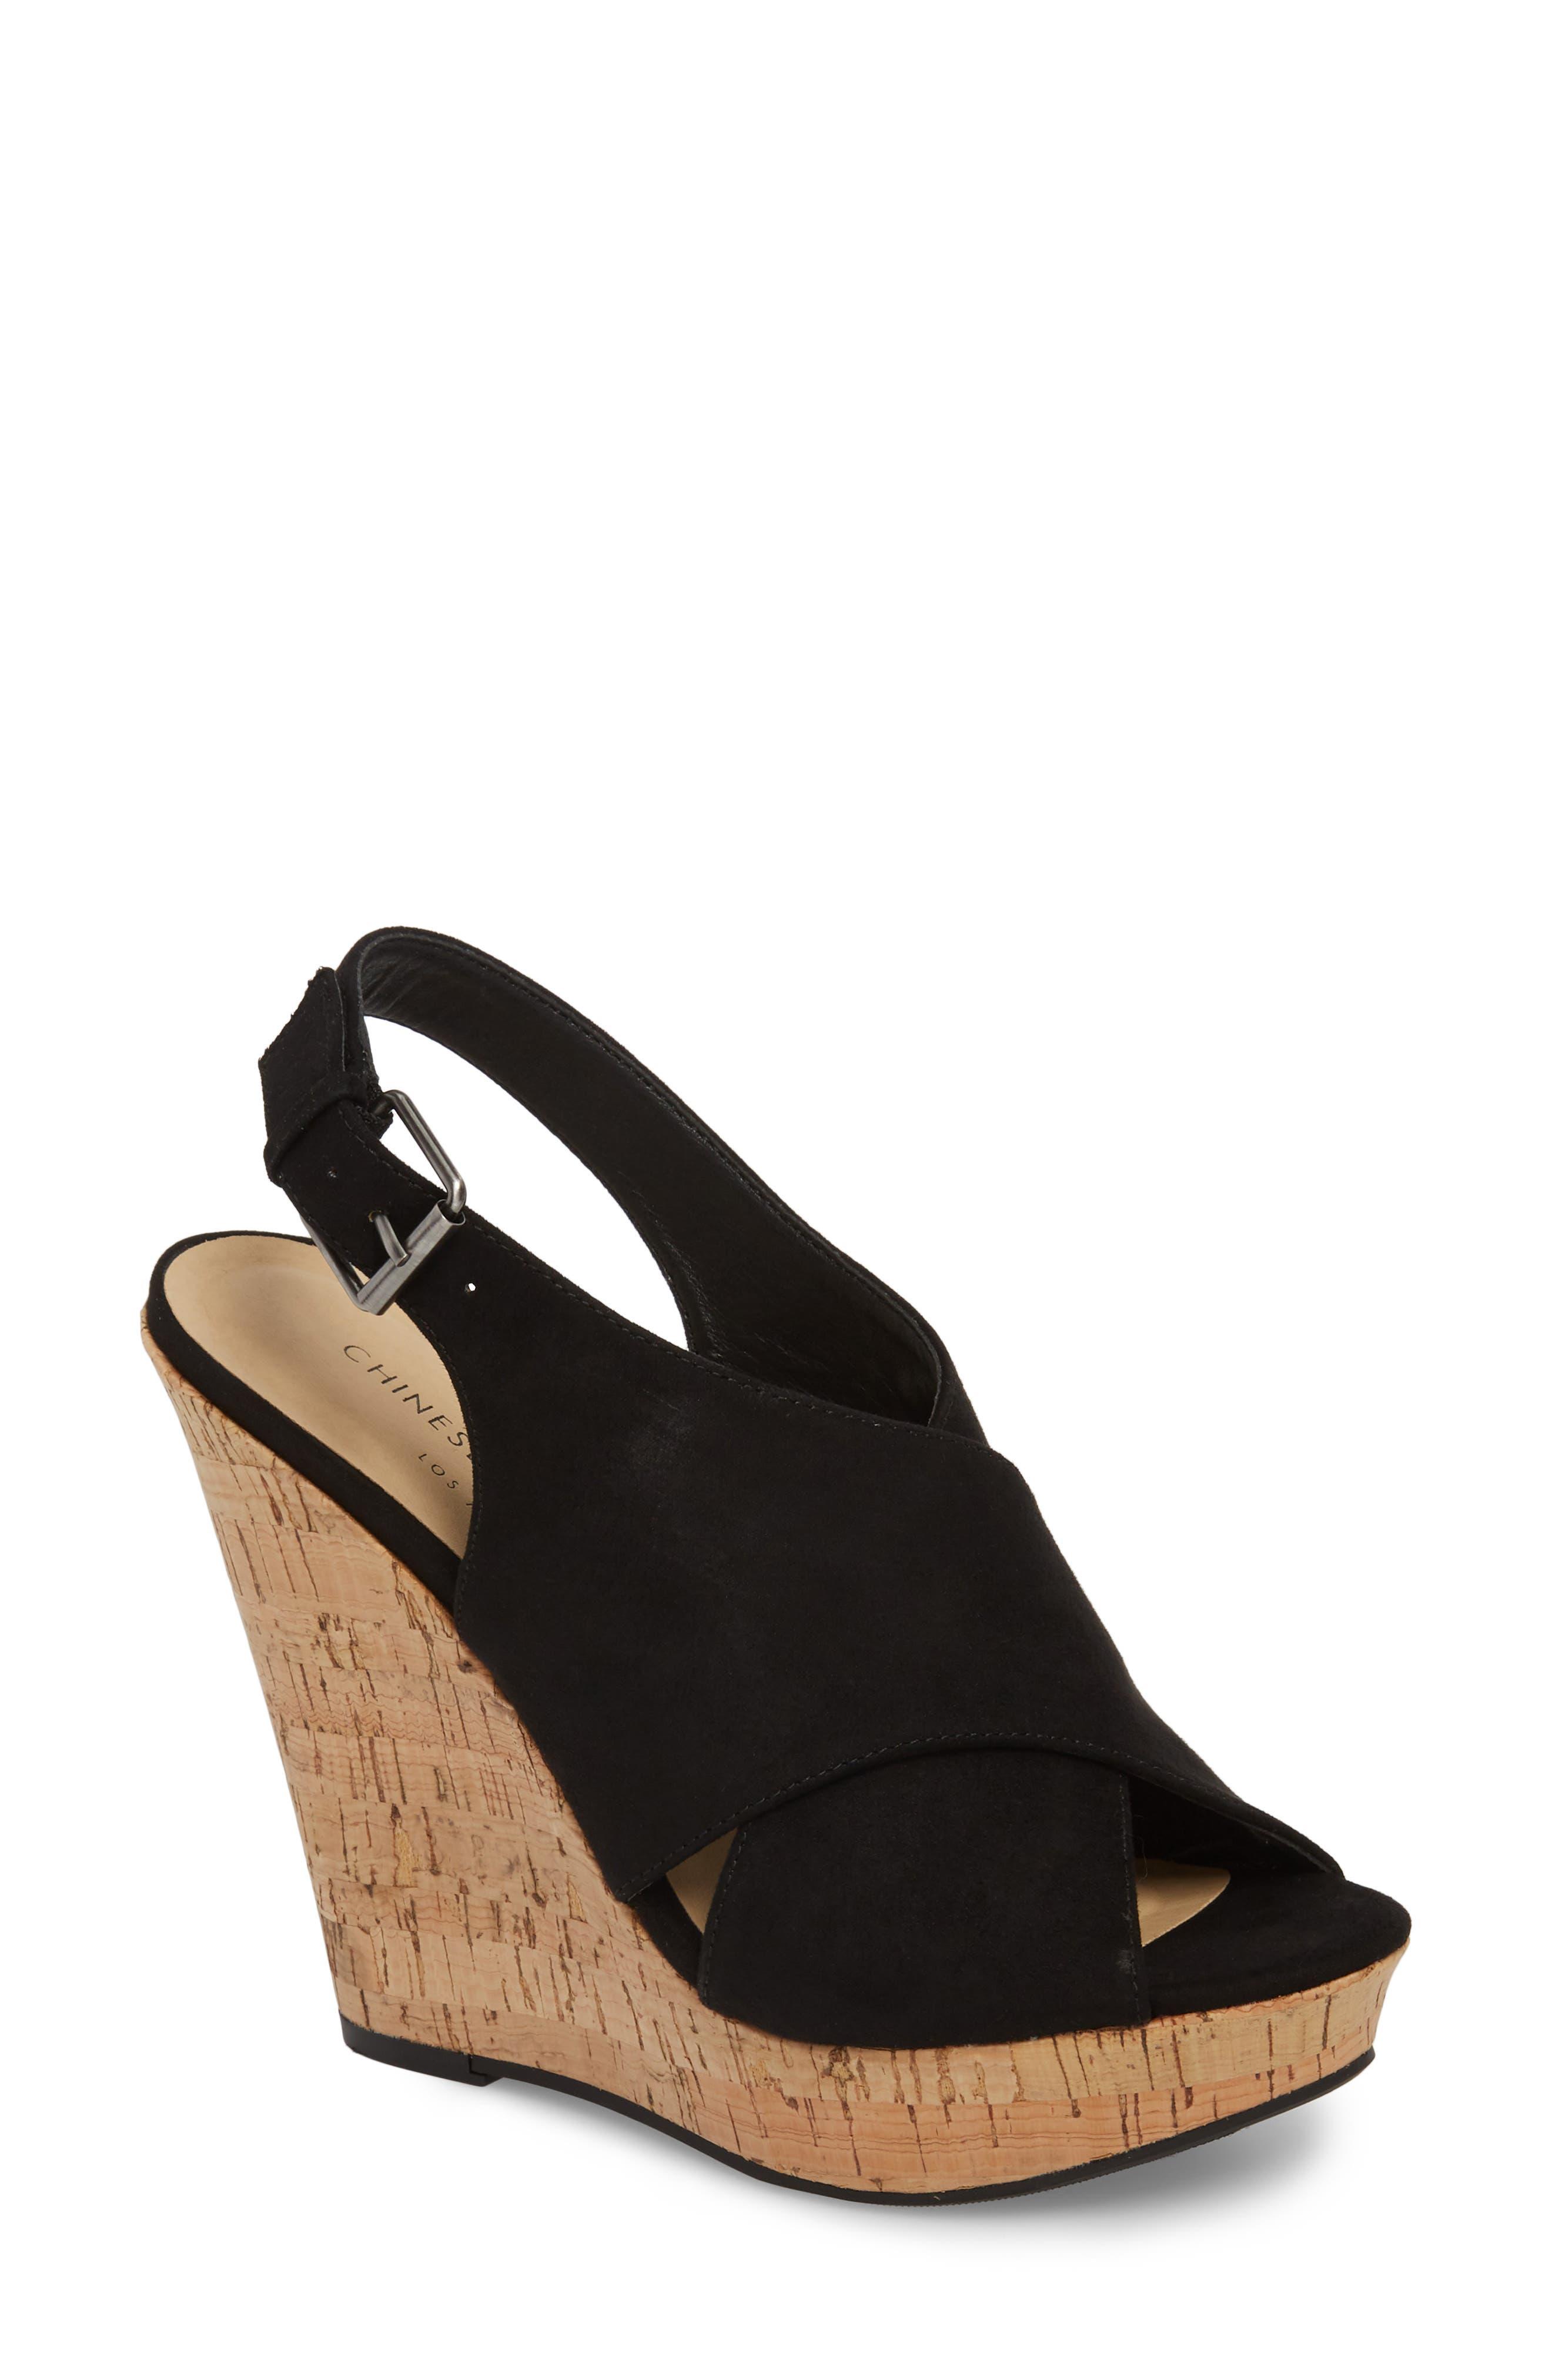 Myya Slingback Wedge Sandal,                             Main thumbnail 1, color,                             BLACK